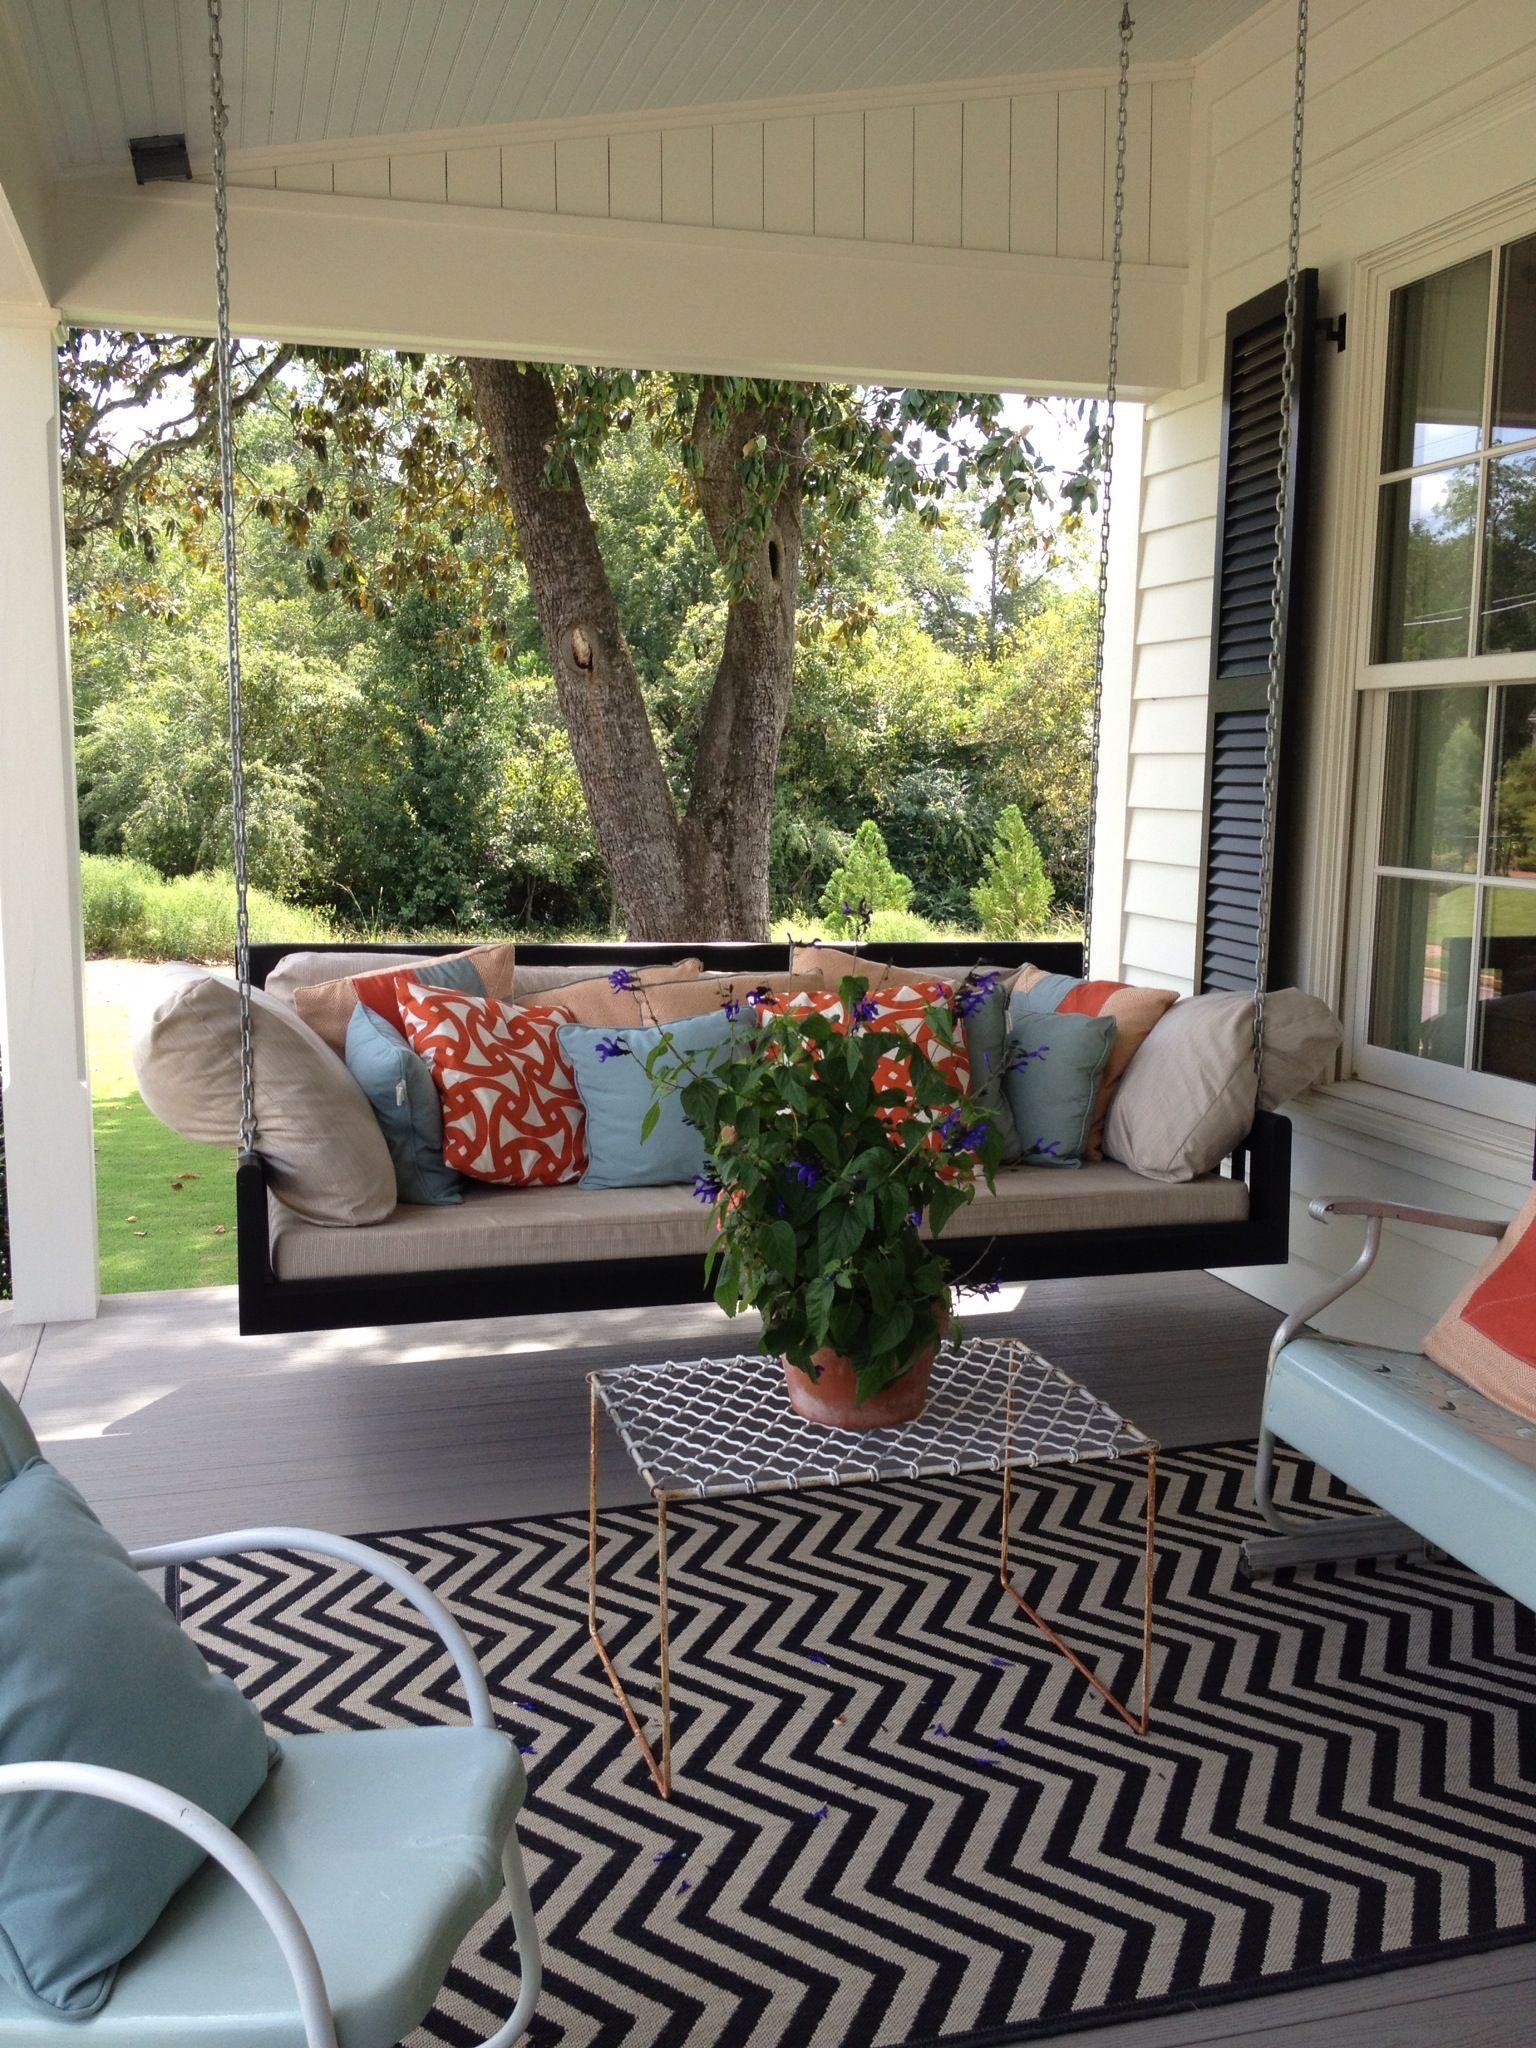 Southern Living Home in Senoia, GA. Front porch design